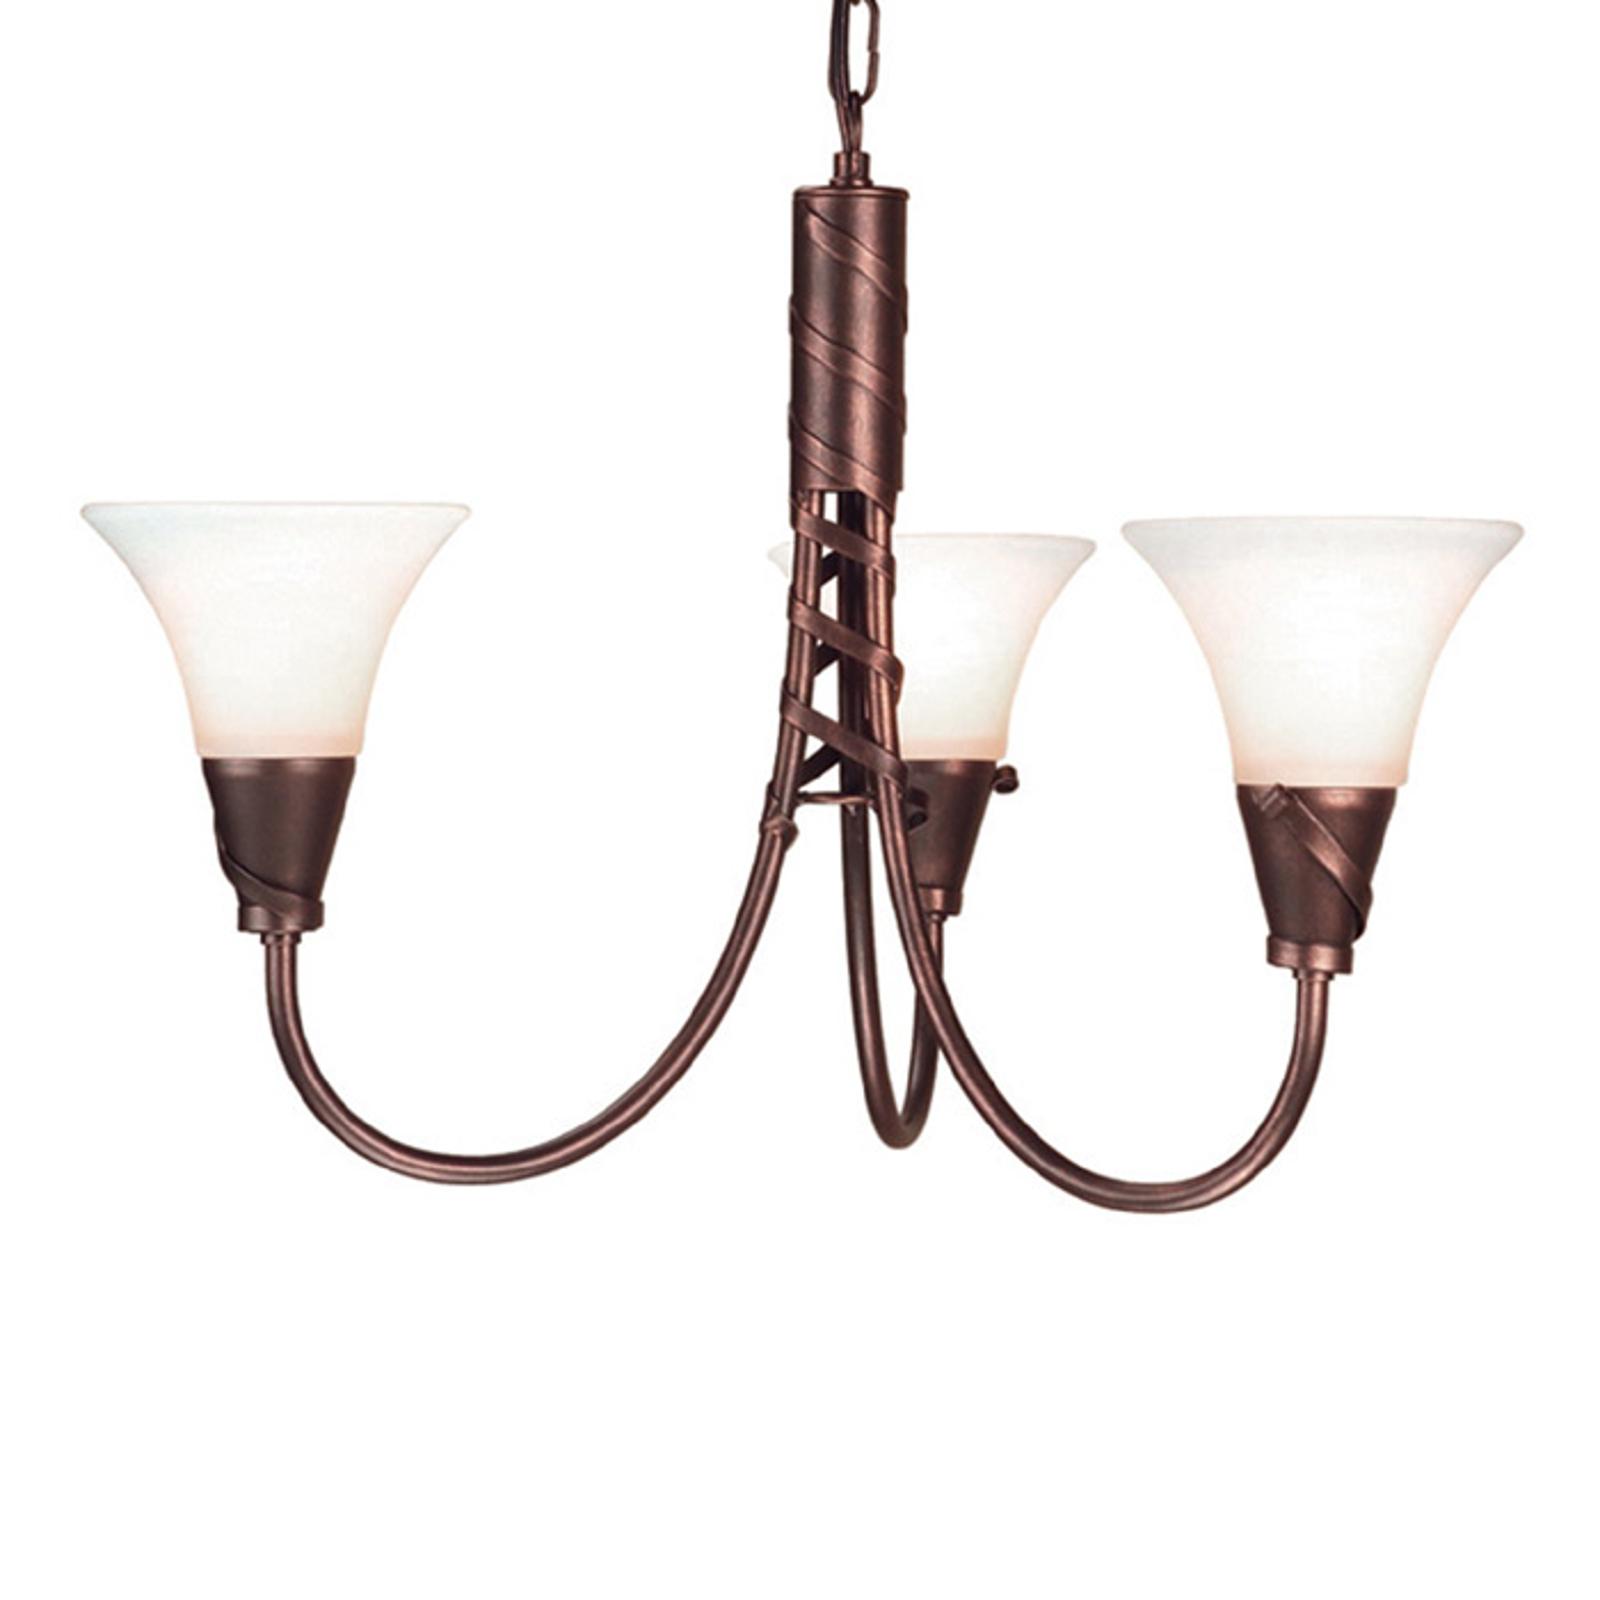 Leuke hanglamp EMILY, 3-lichts